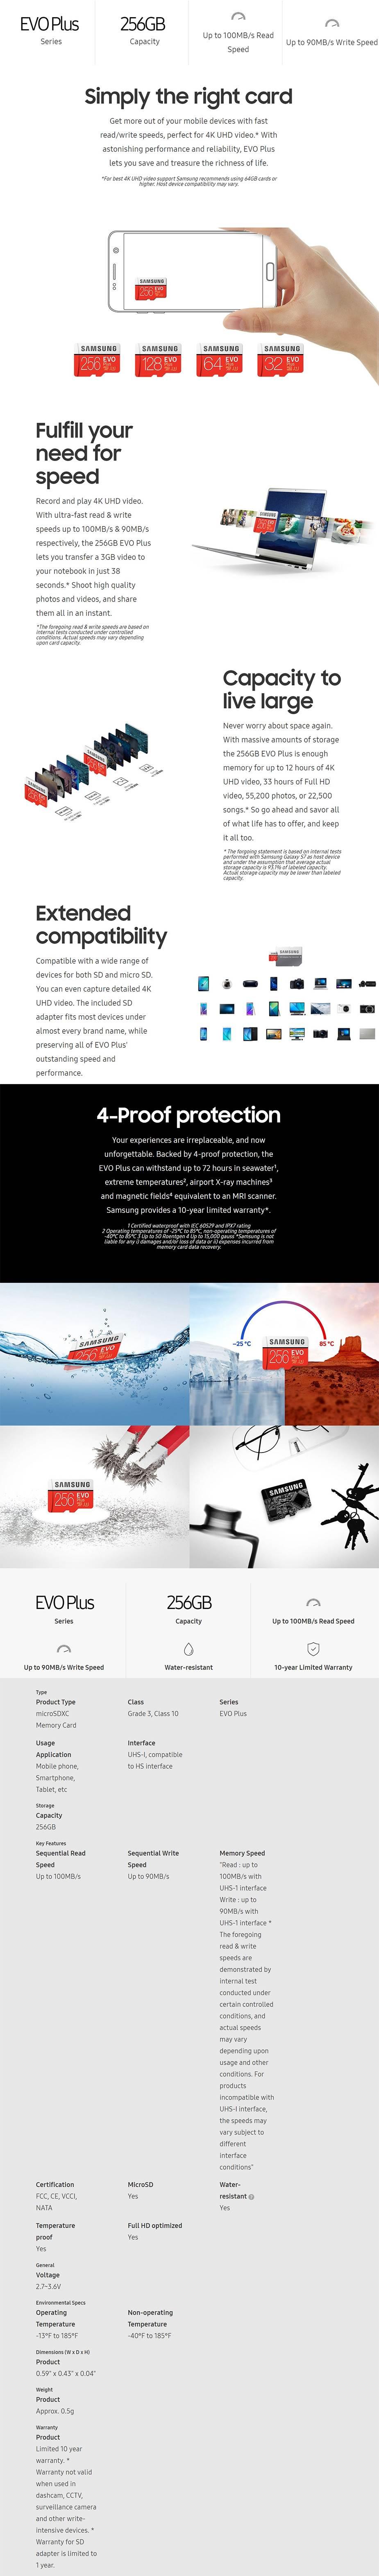 Samsung 256GB microSDXC EVO Plus UHS-I Class 10 Memory Card - 100MB/s - Desktop Overview 1